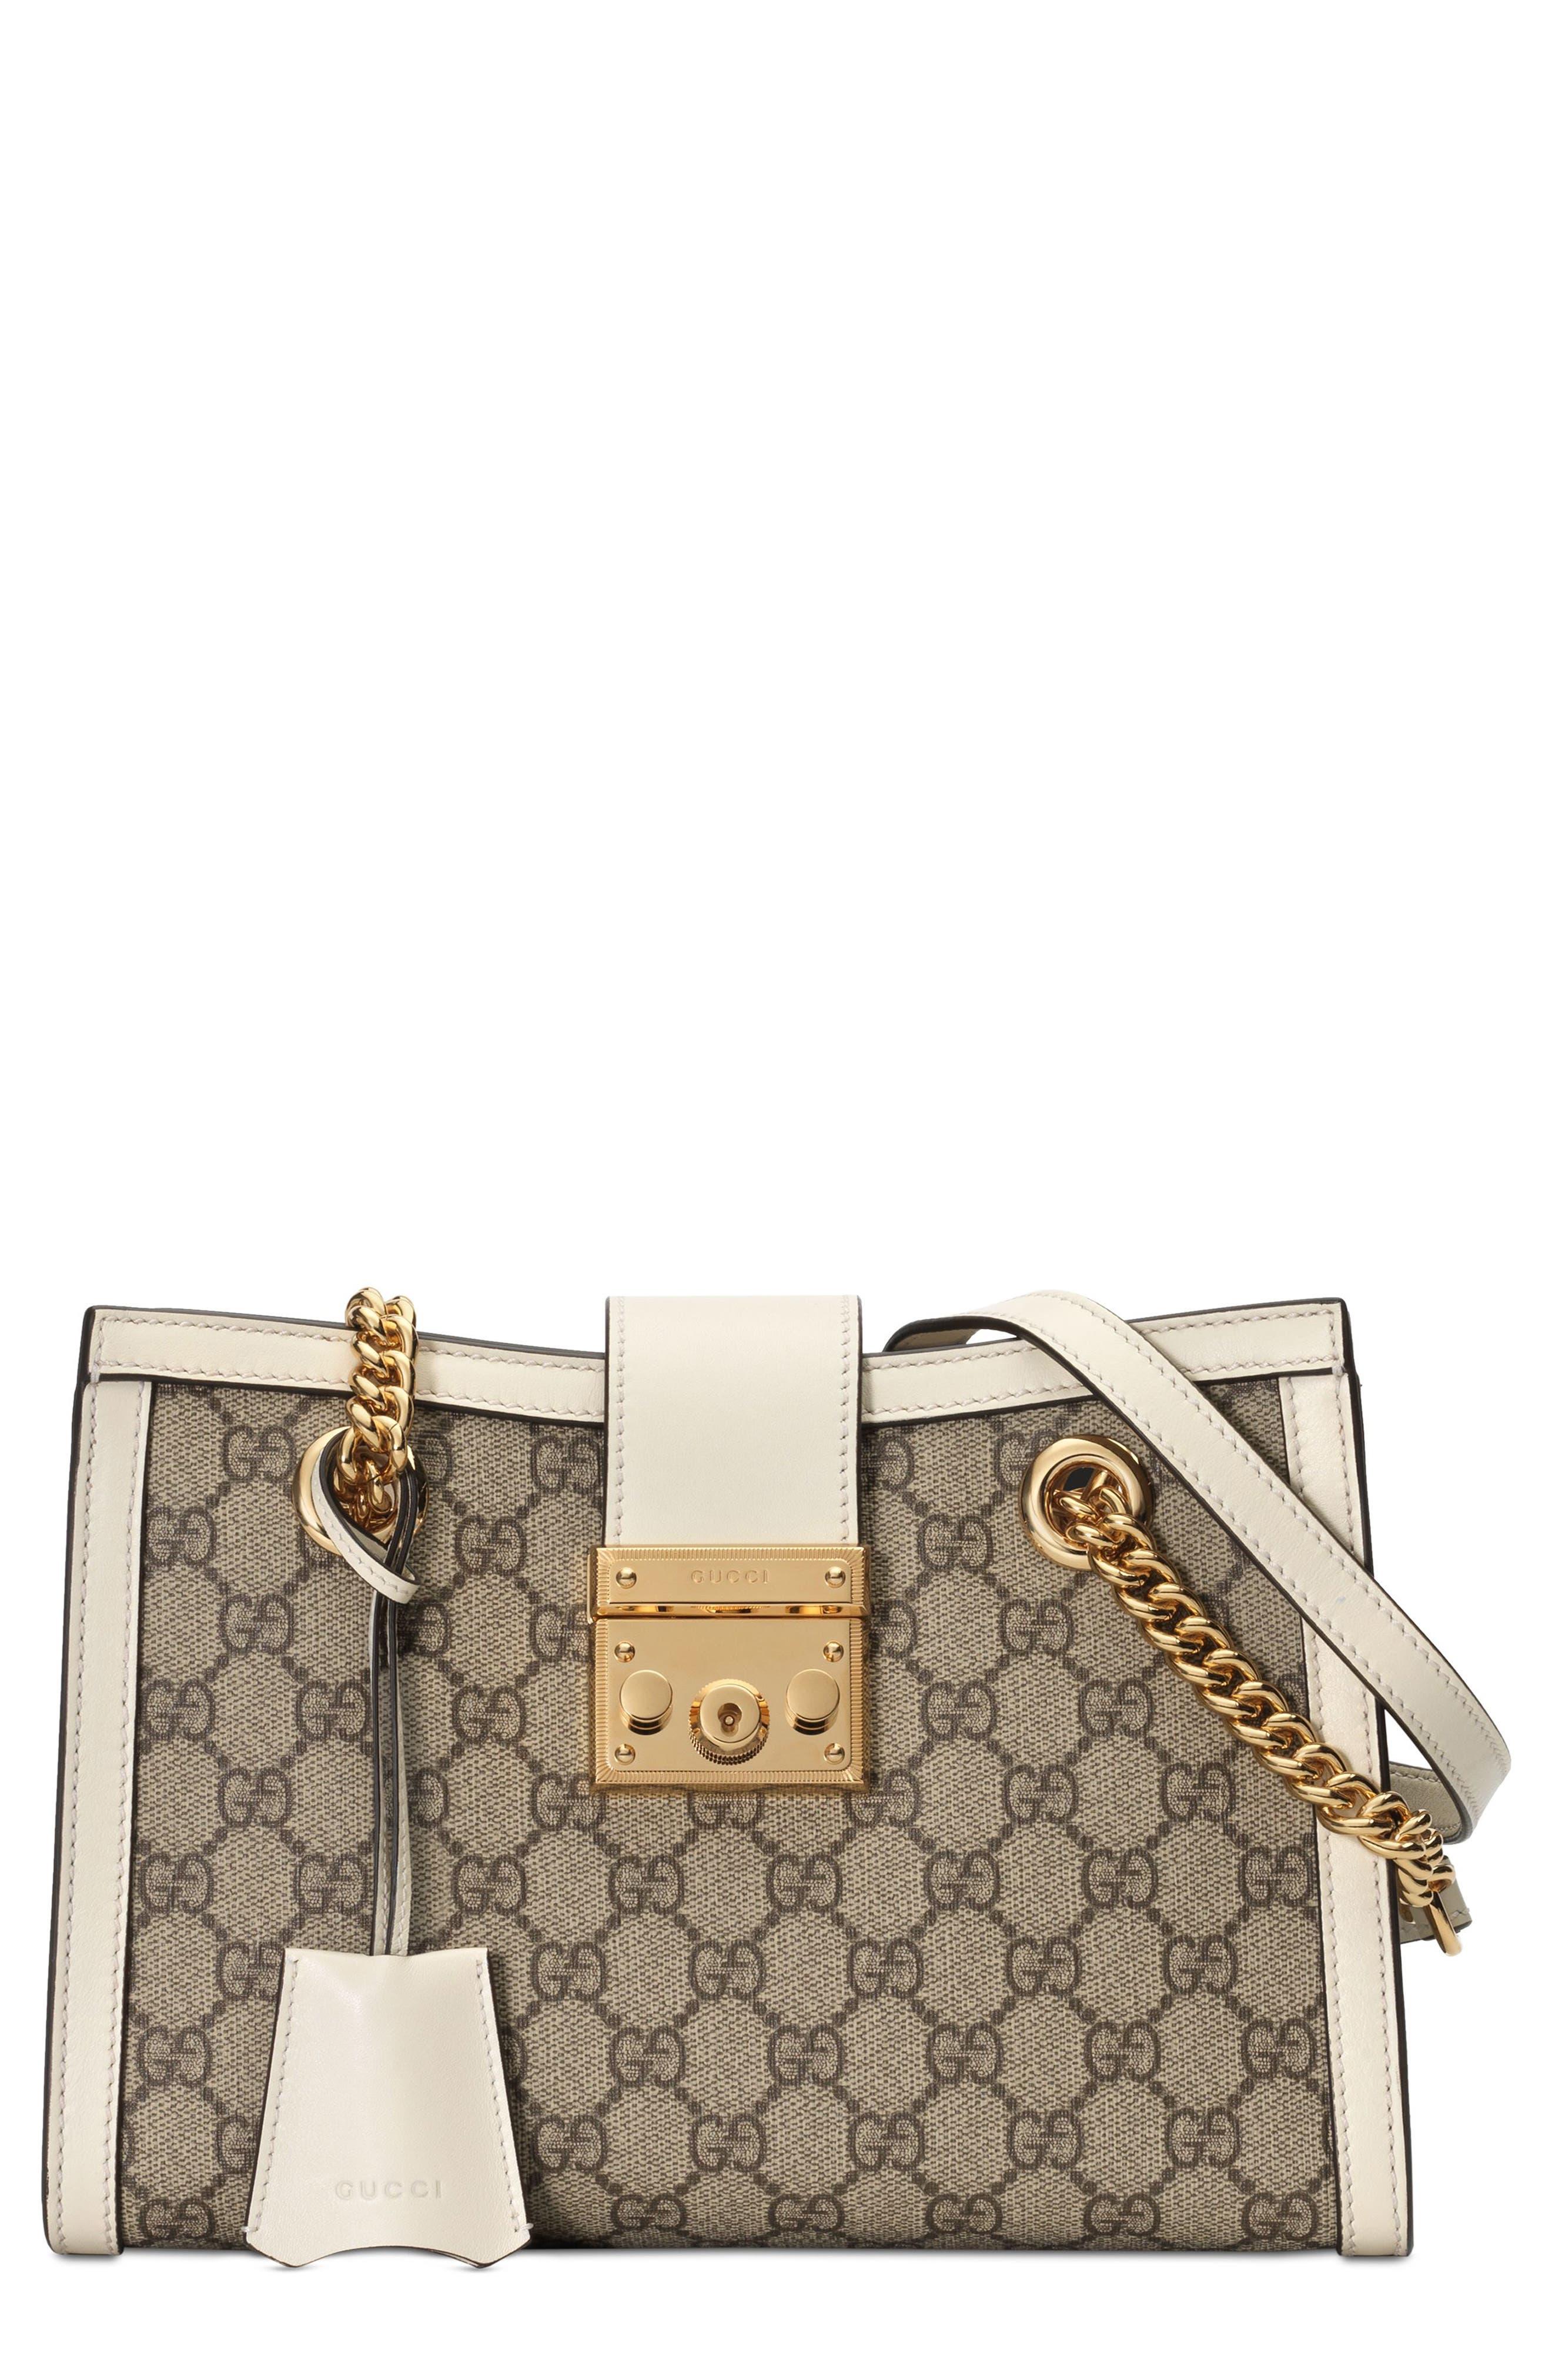 Small Padlock GG Supreme Shoulder Bag,                         Main,                         color, BEIGE EBONY/ MYSTIC WHITE